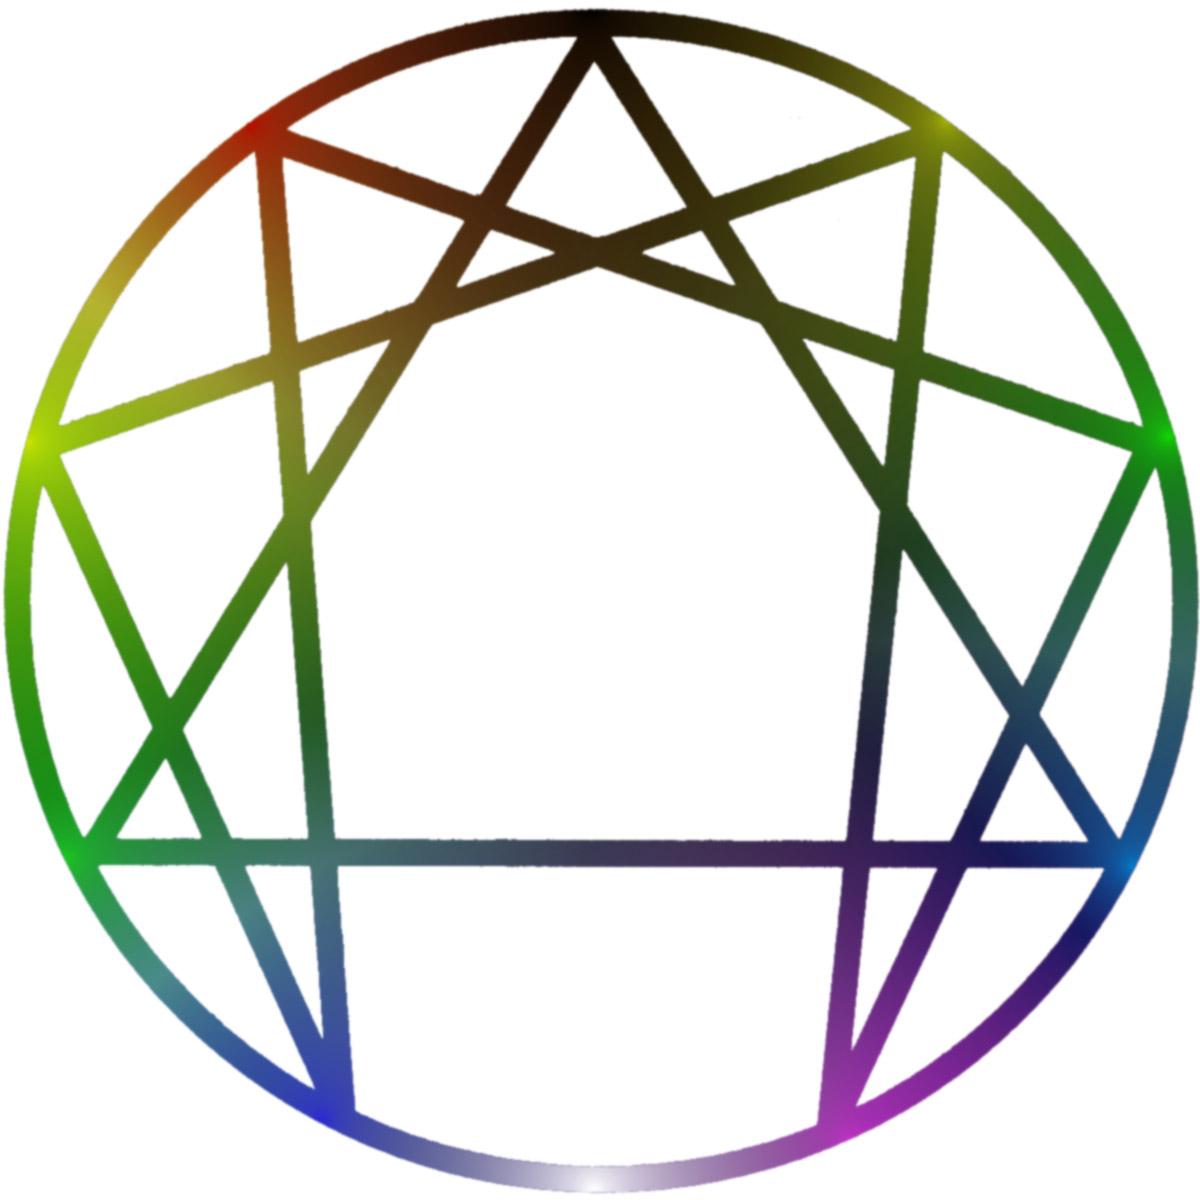 enneagram-diagram.jpg